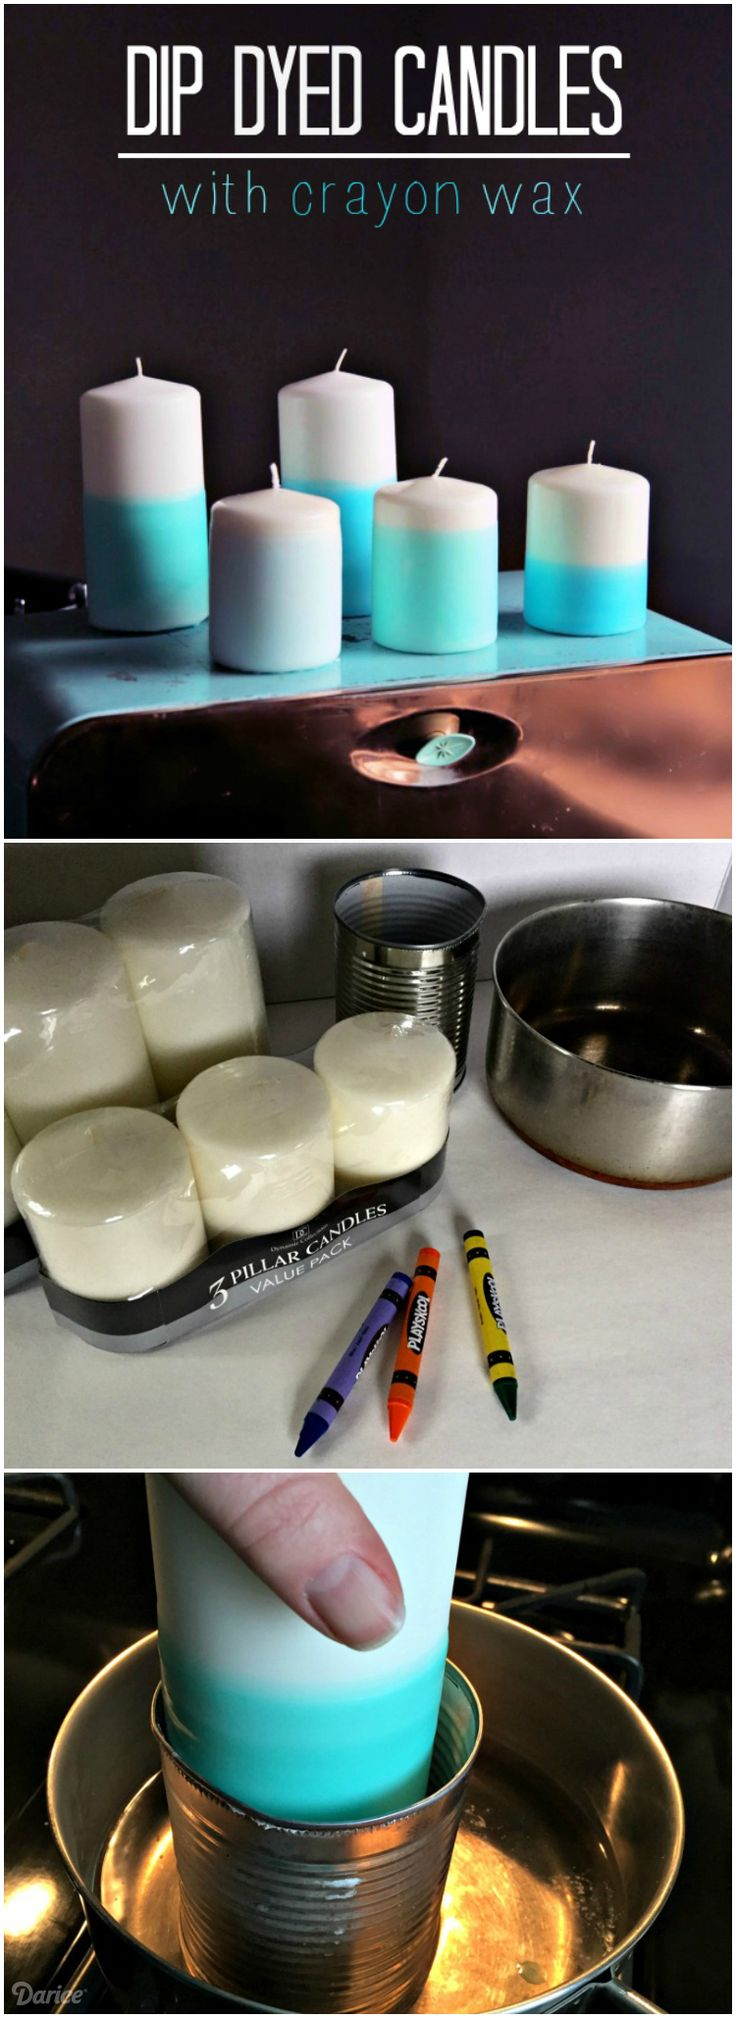 Candle DIY Project: Crayon Wax Dip Dye Technique - Darice